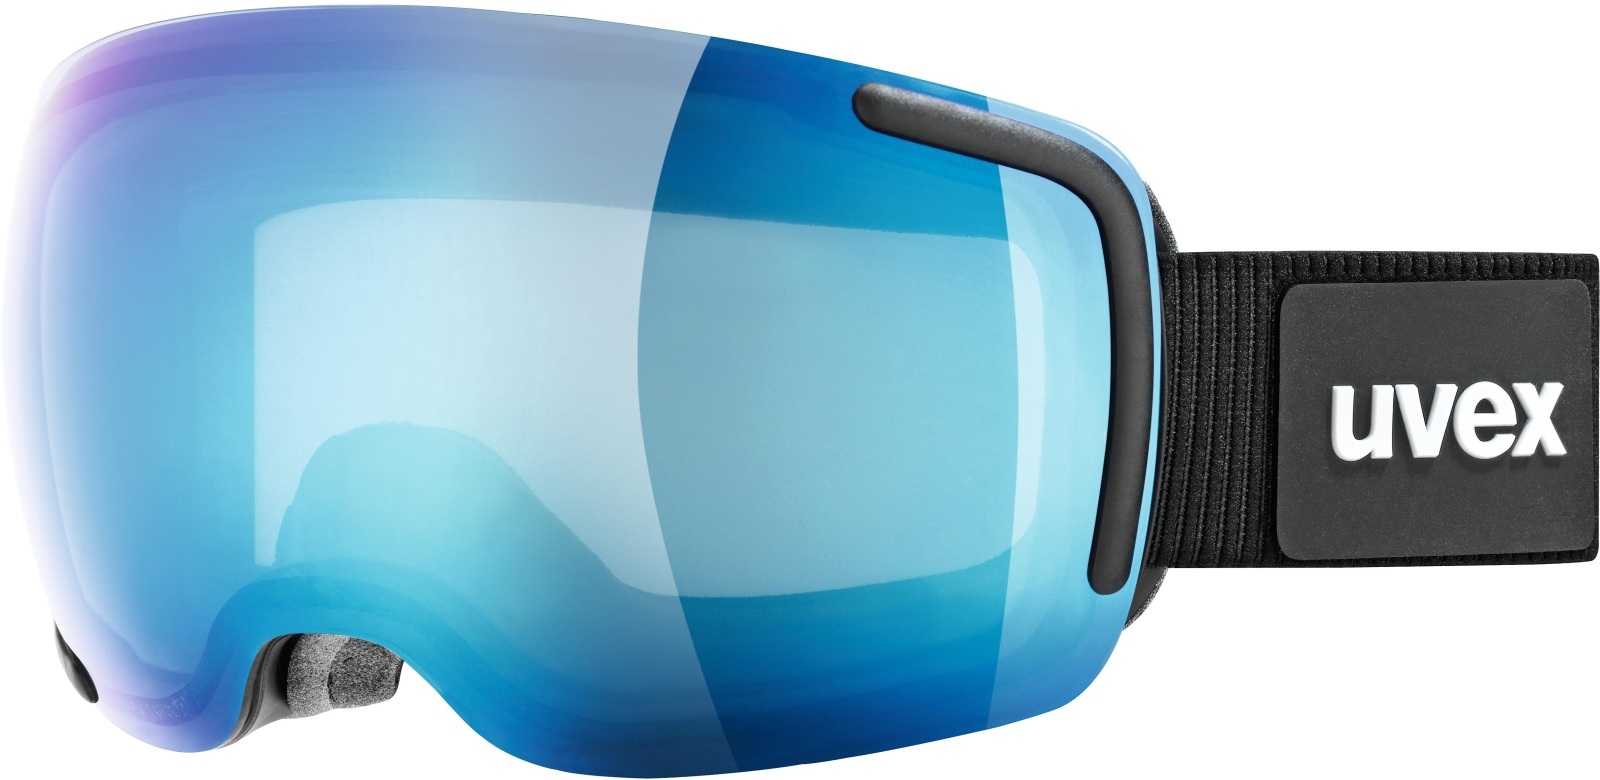 Uvex Big 40 FM Black-Blue DL/mirror blue clear (S2) uni